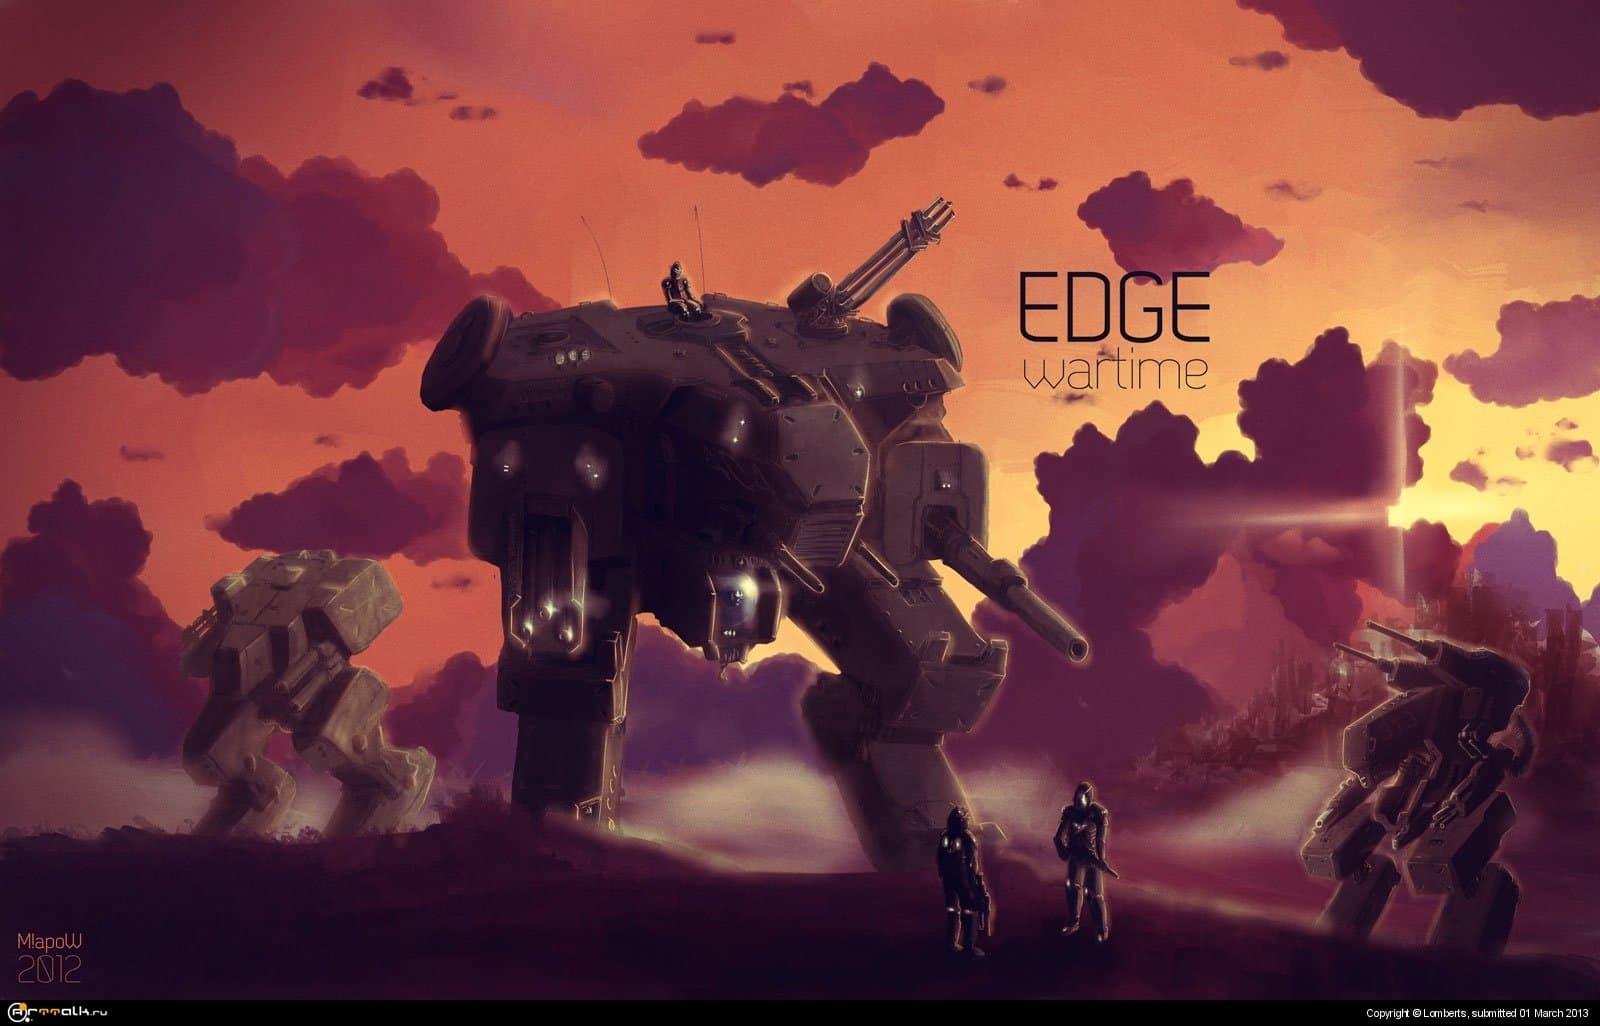 Edge Sunset